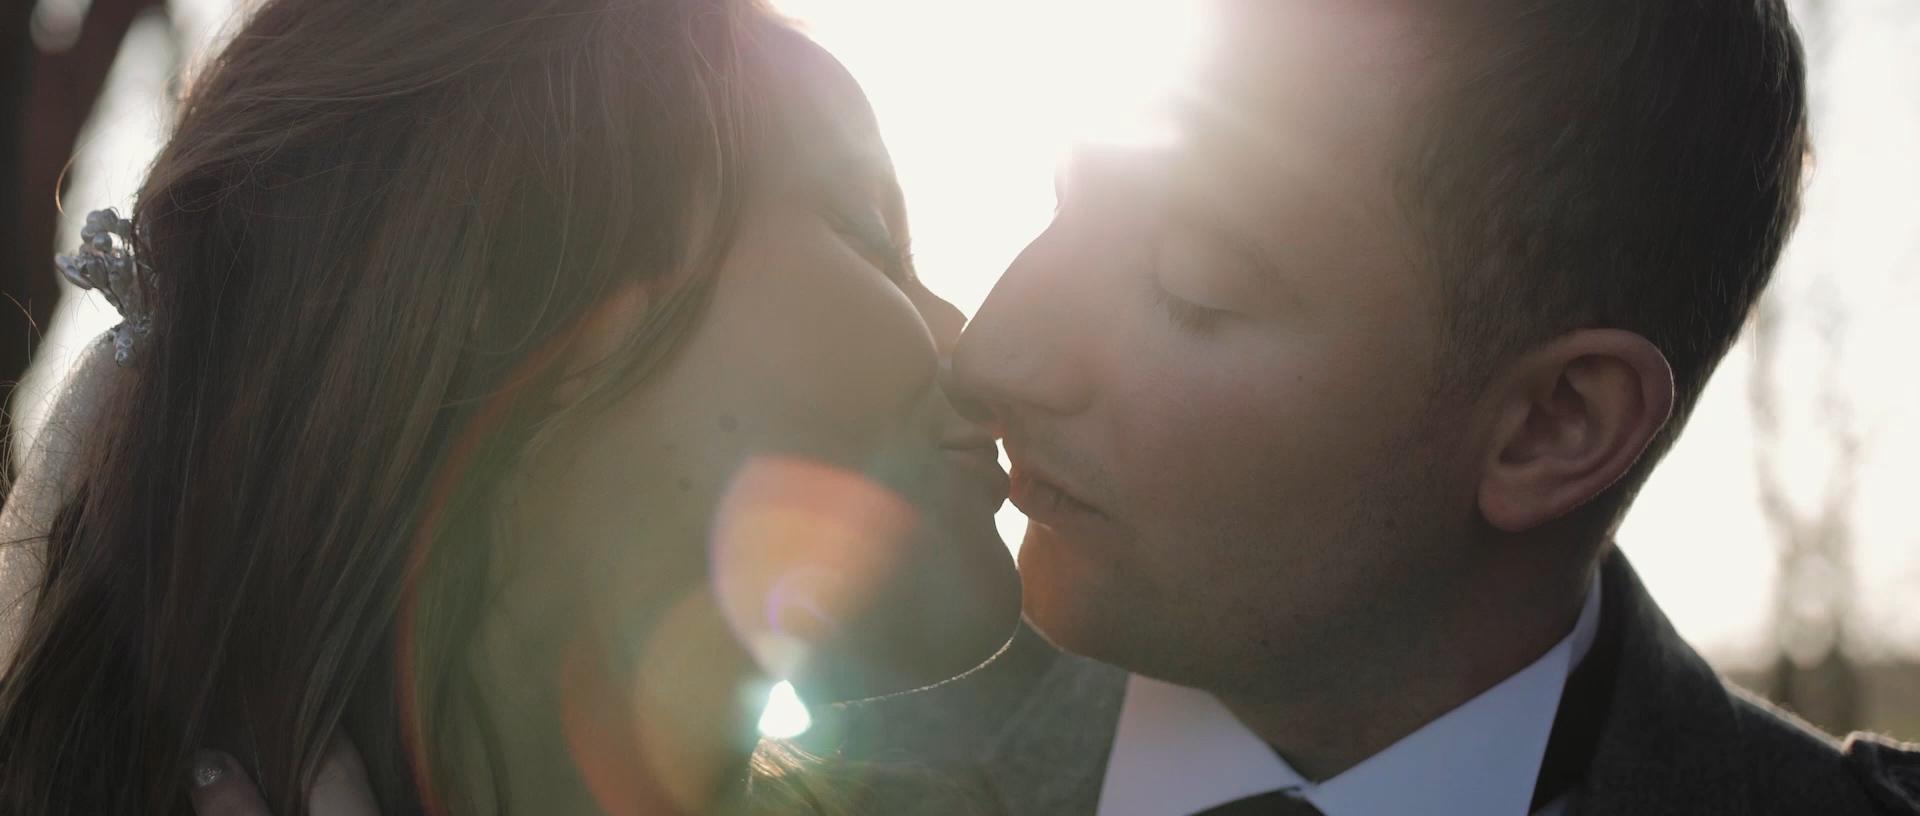 drygate-wedding-videographer_LL_03.jpg